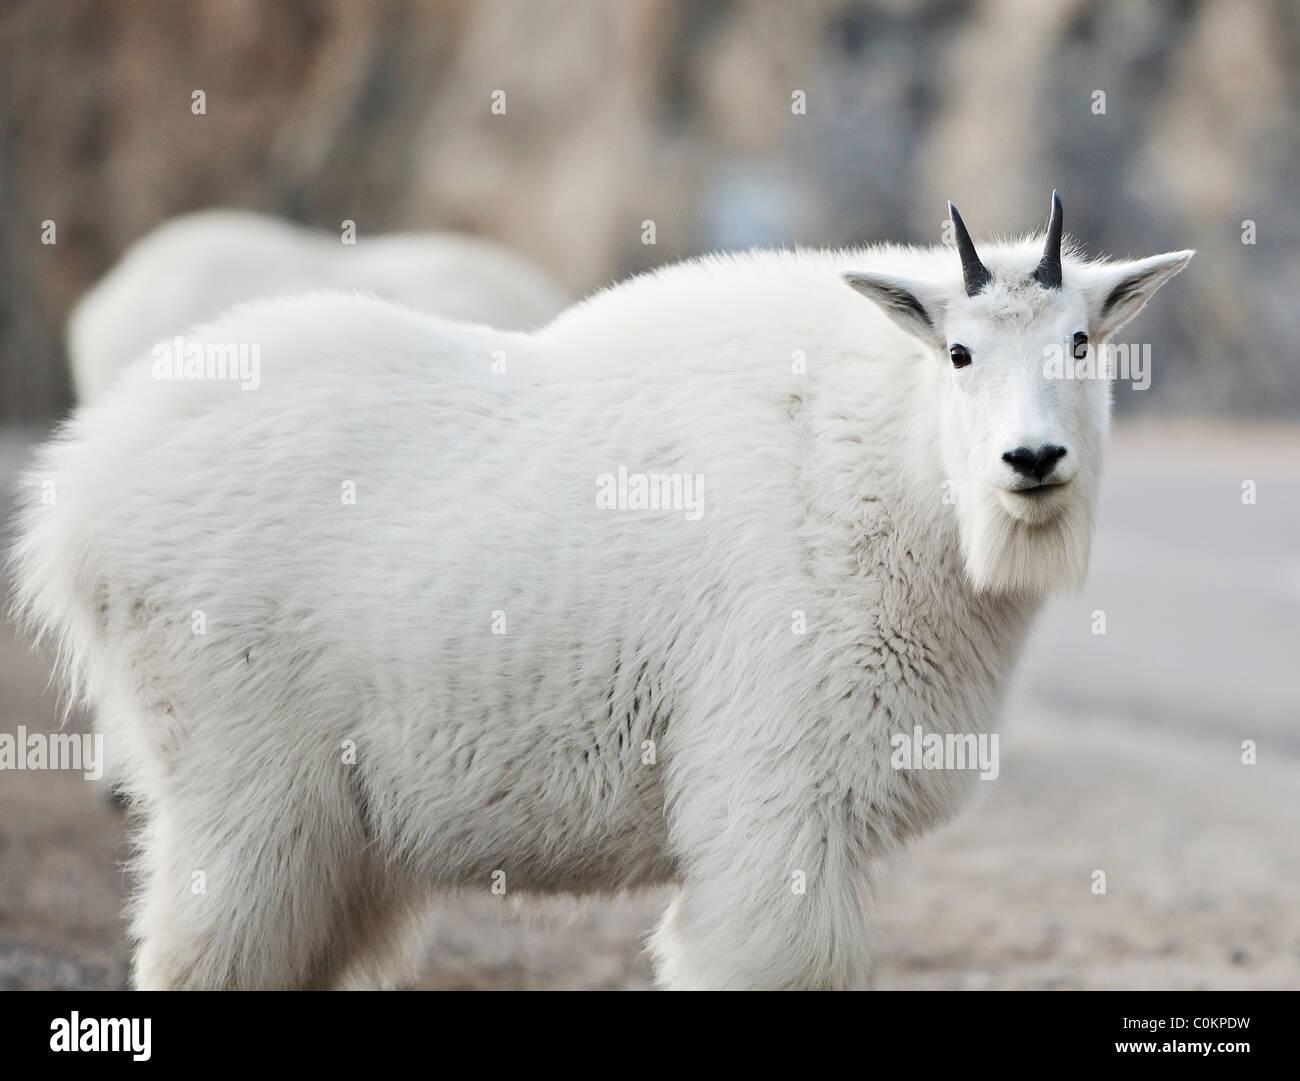 Mountain Goat, Jasper National Park, Alberta, Canada. - Stock Image